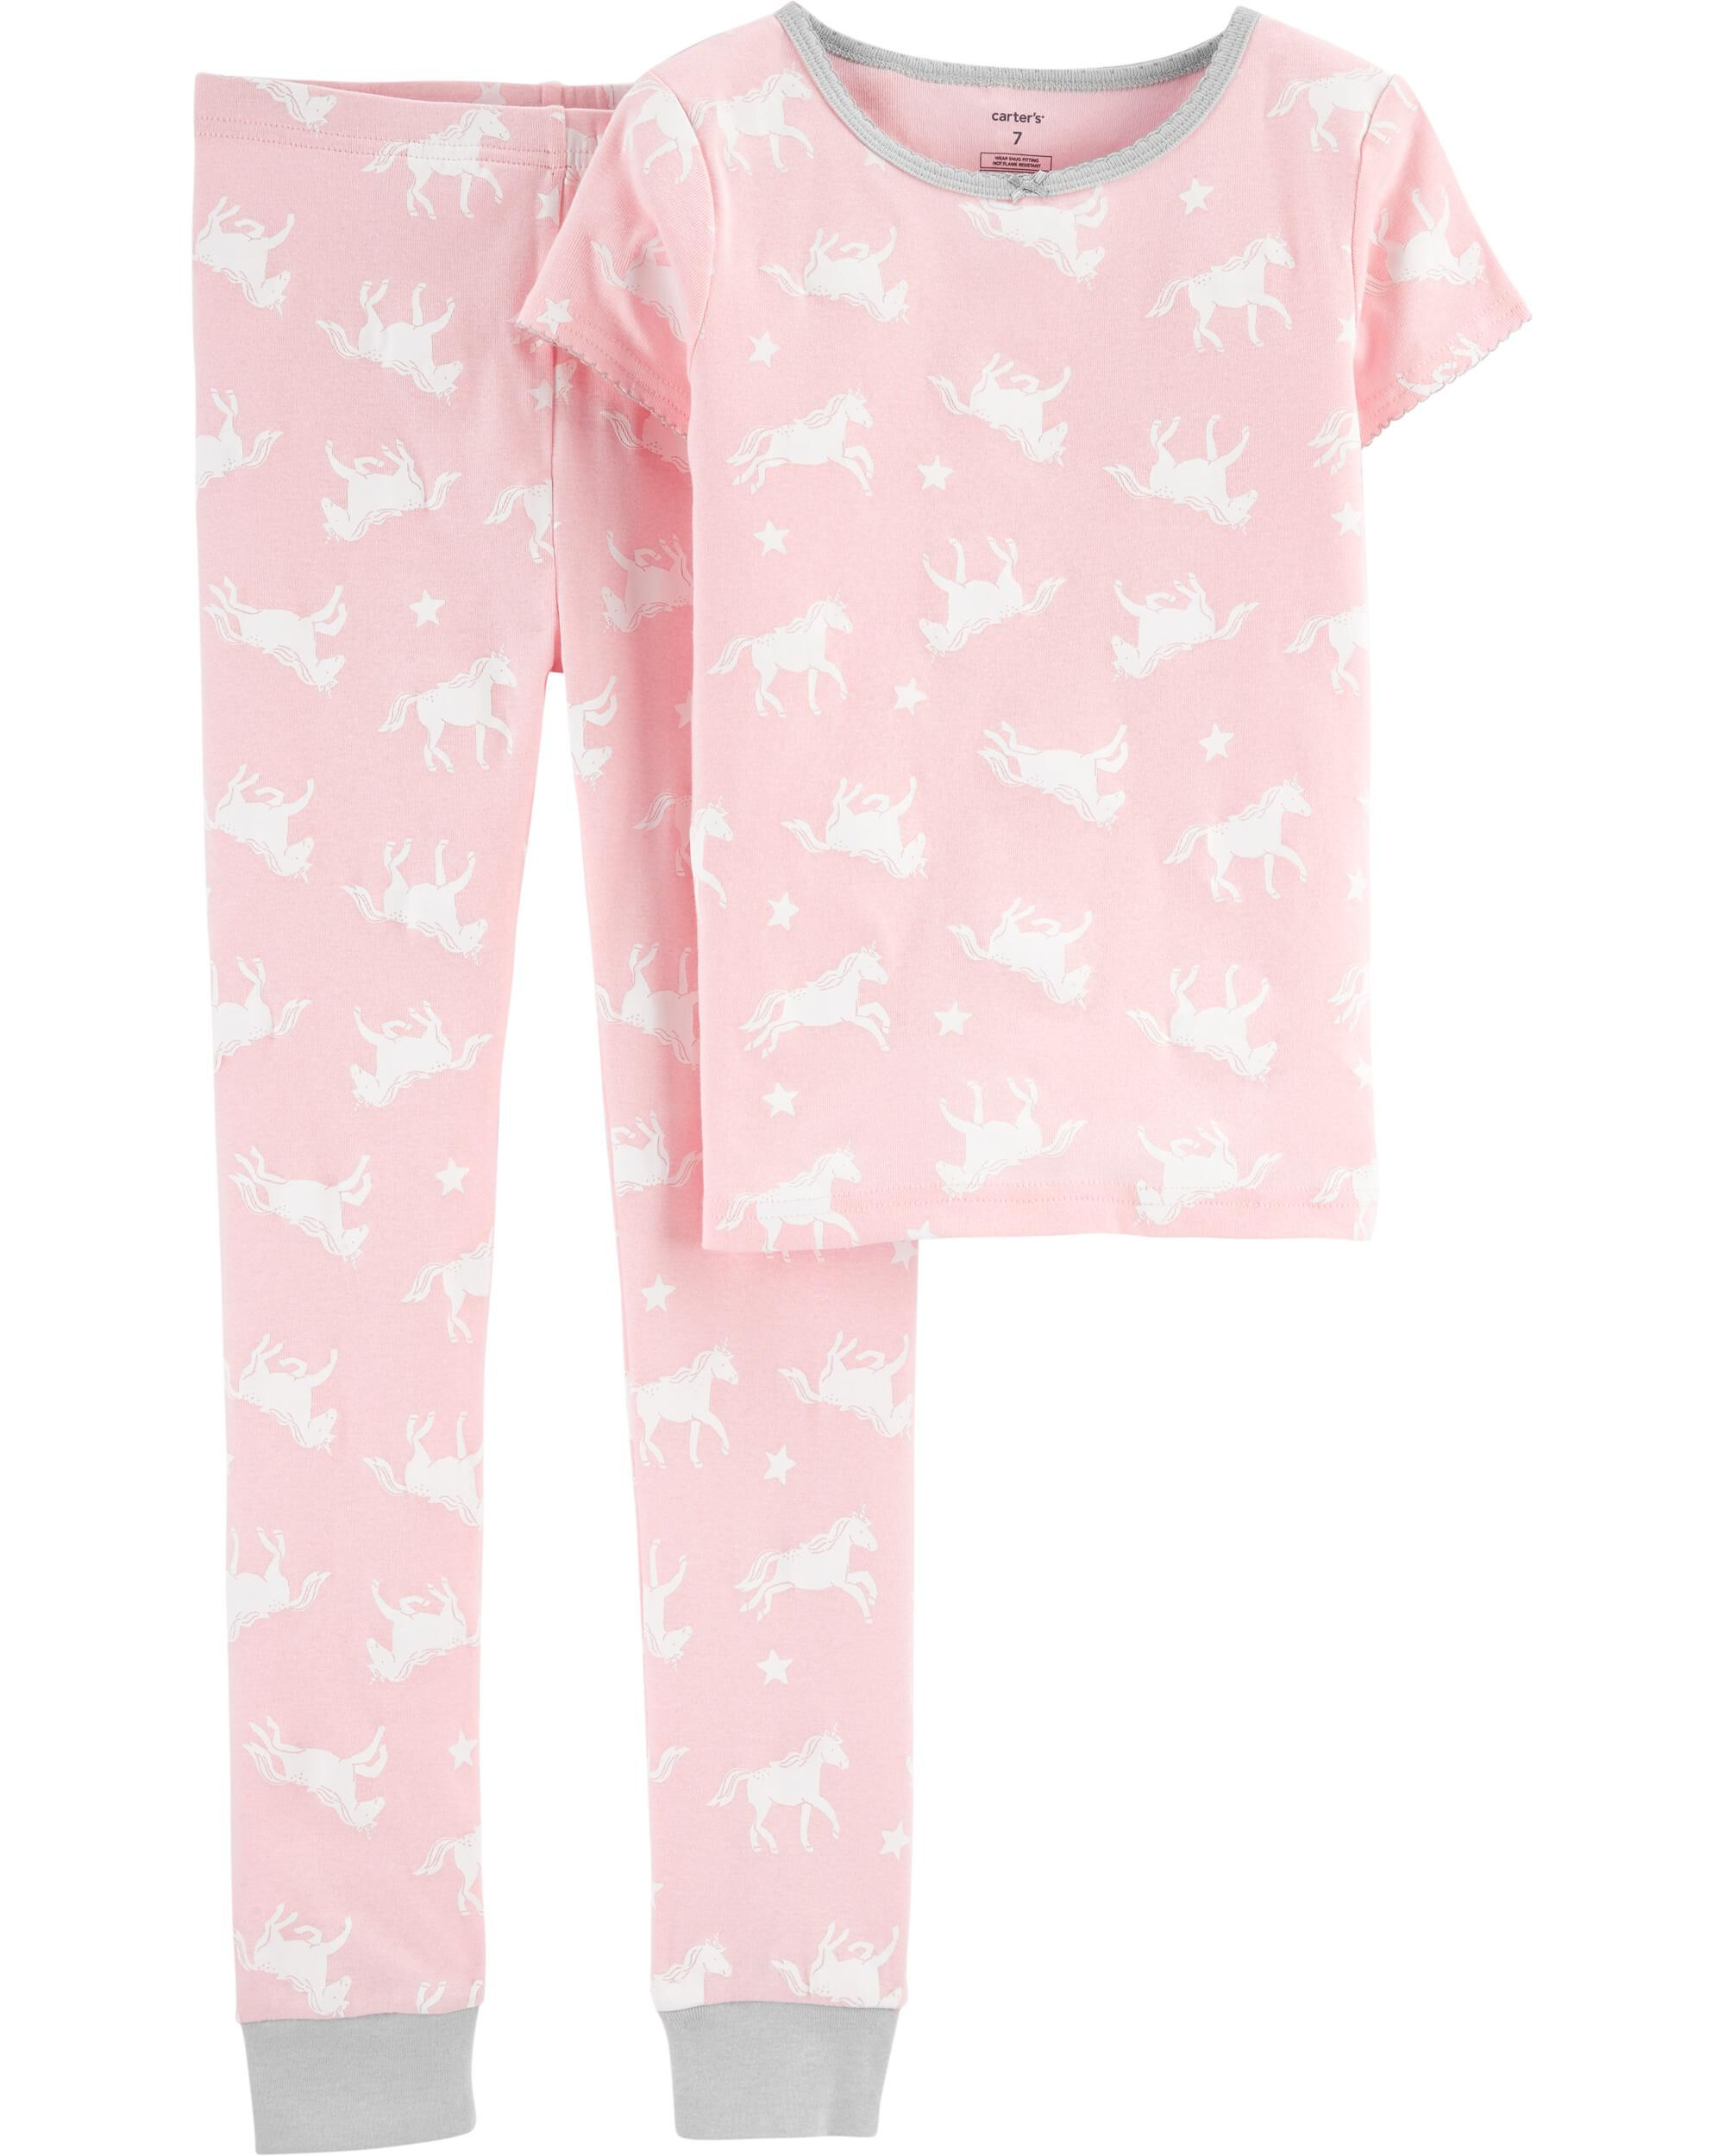 *DOORBUSTER* 2-Piece Unicorn Snug Fit Cotton PJs